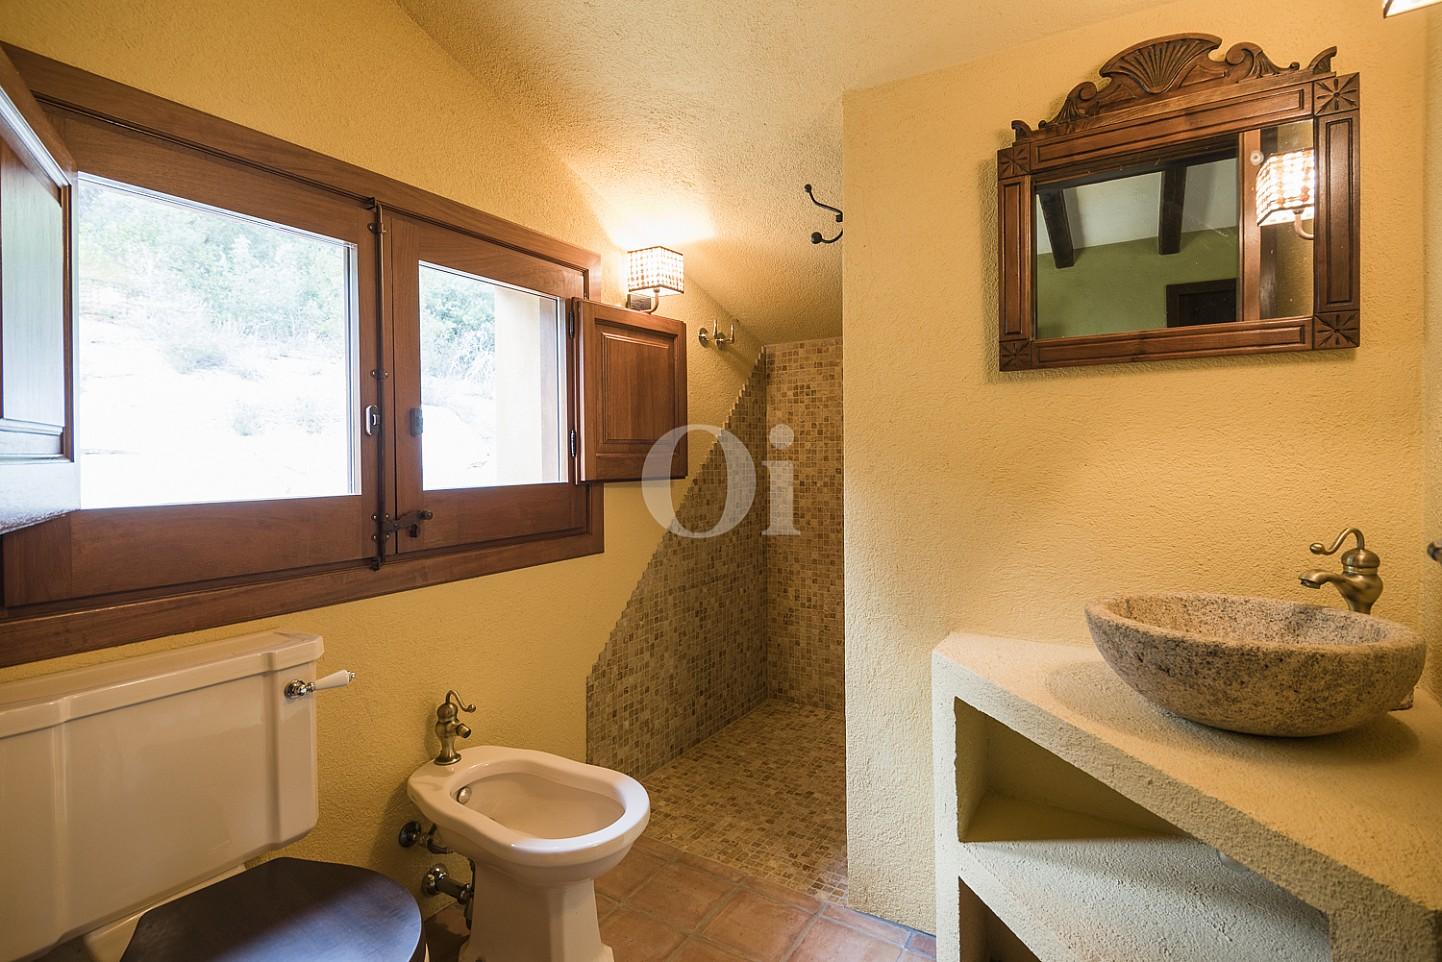 Ванная комната дома на продажу в Орриус